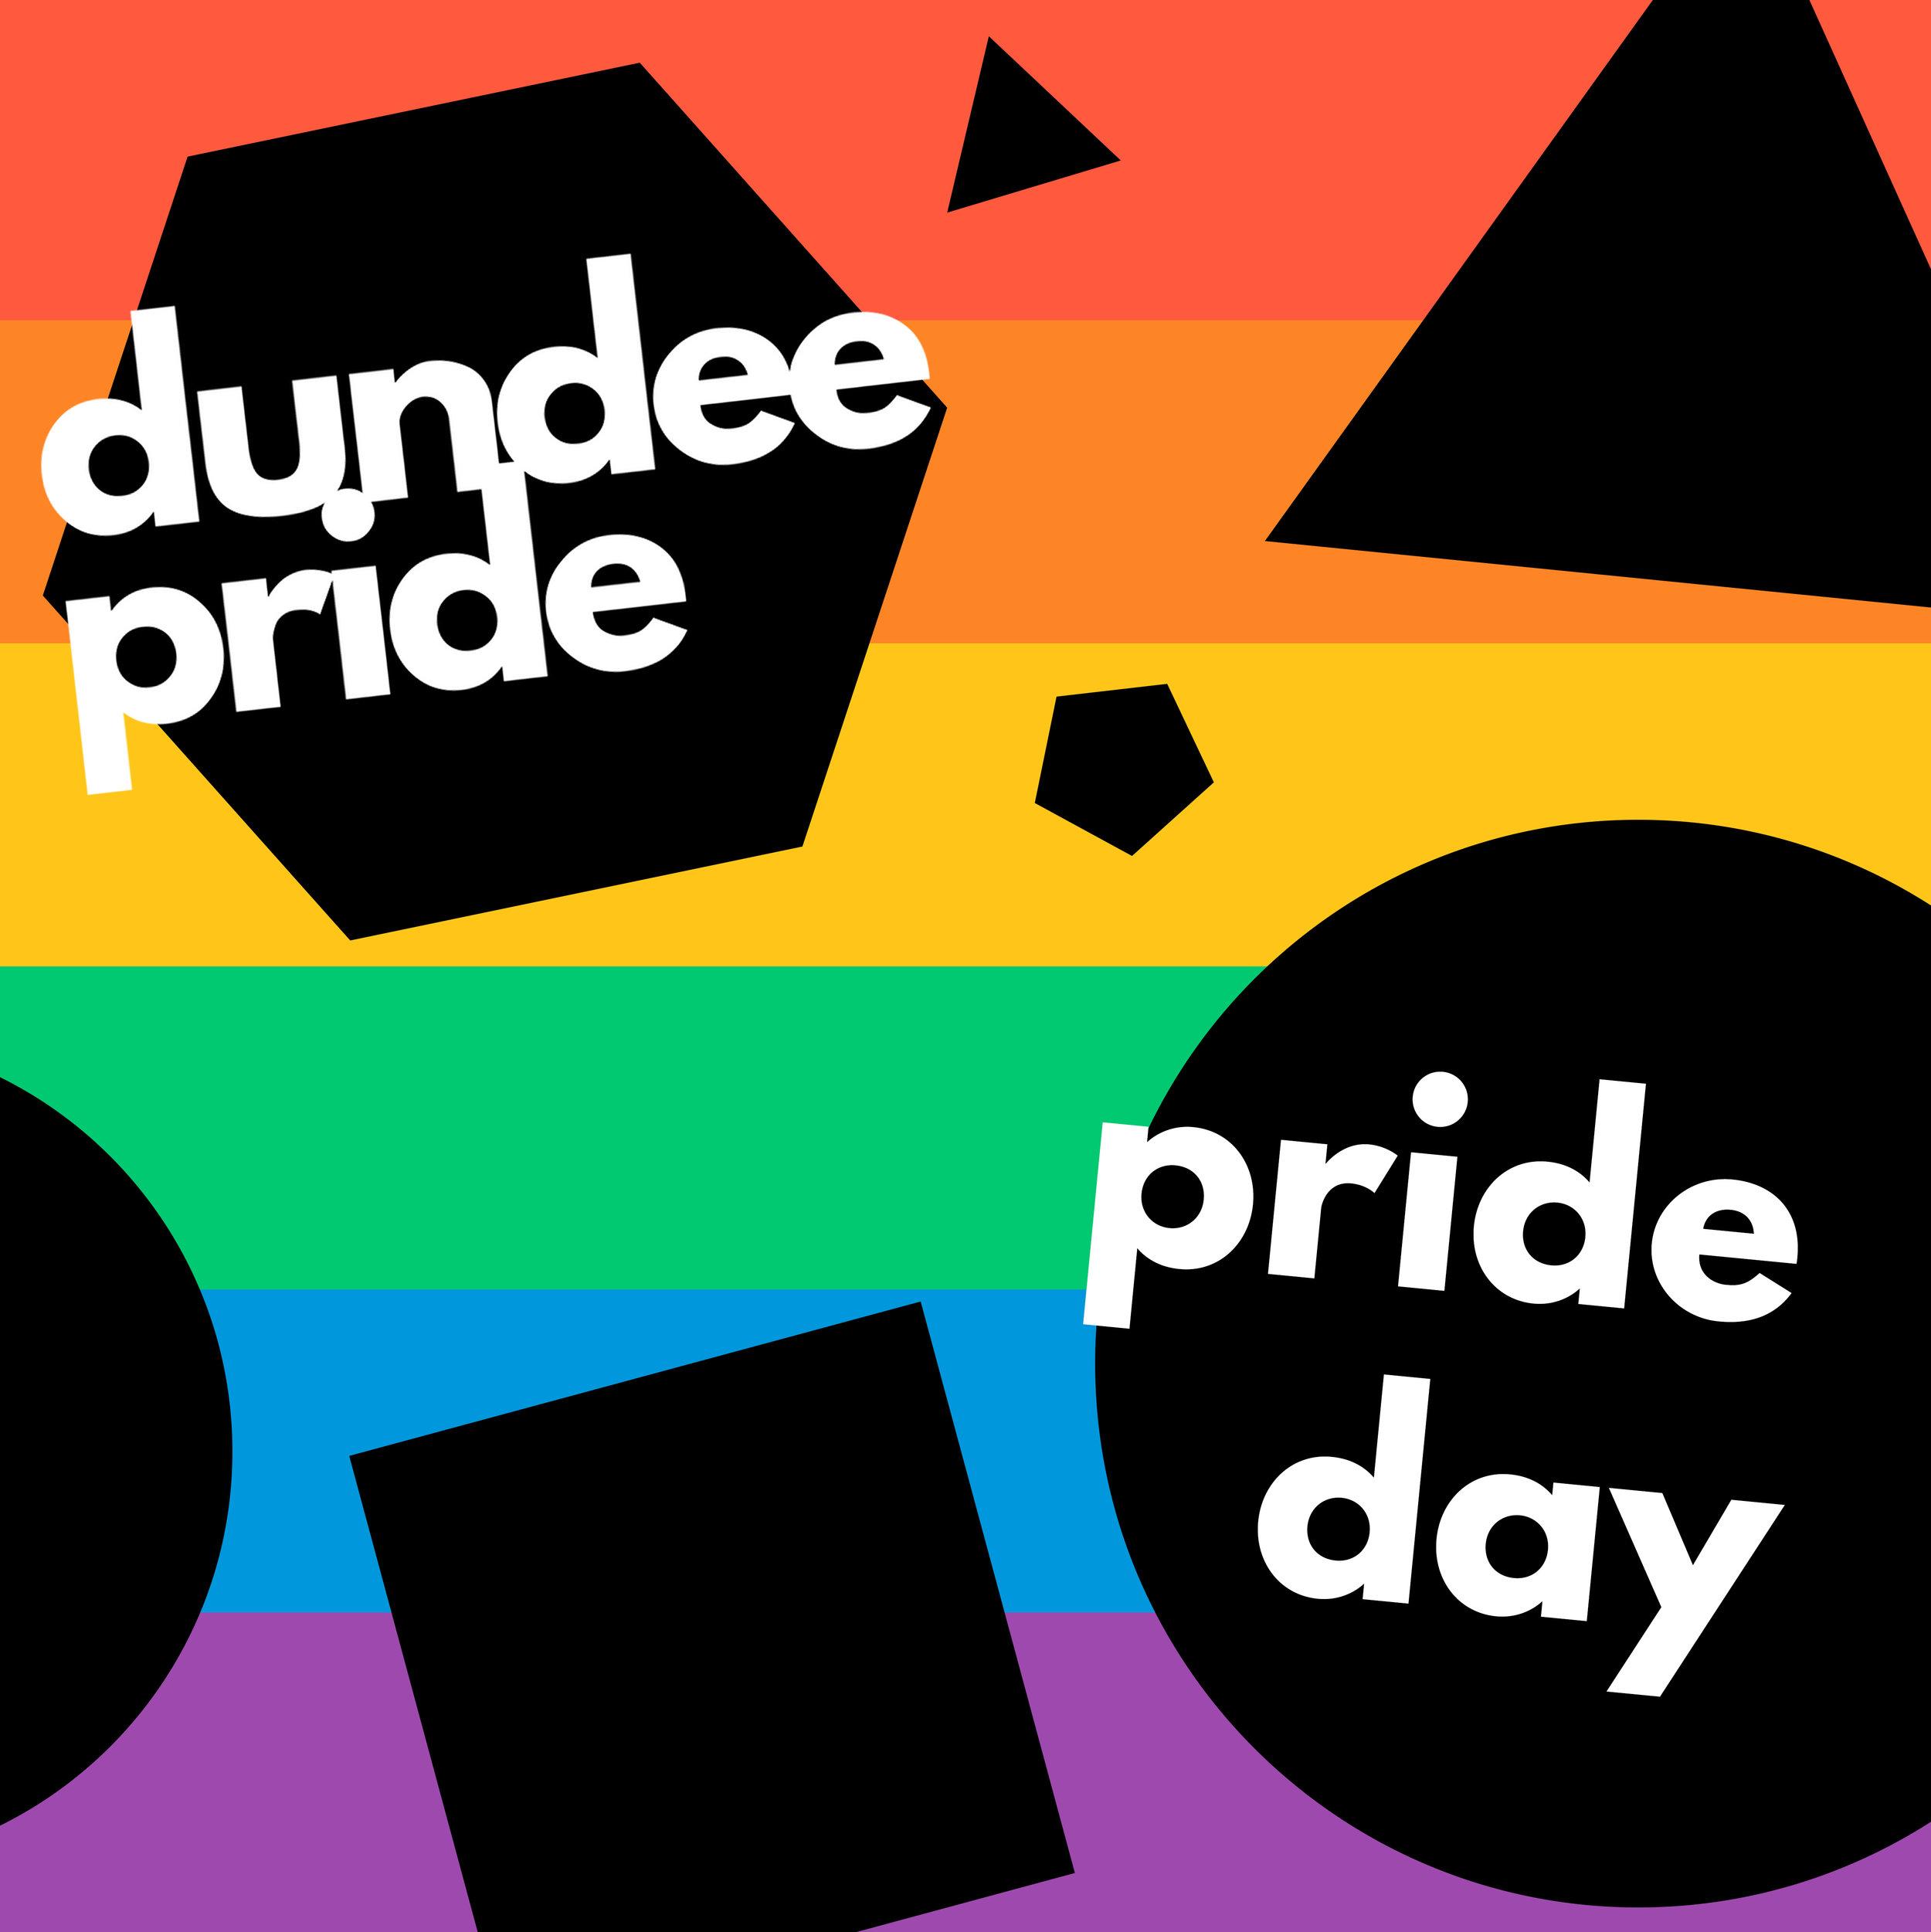 DP pride day generic.jpg